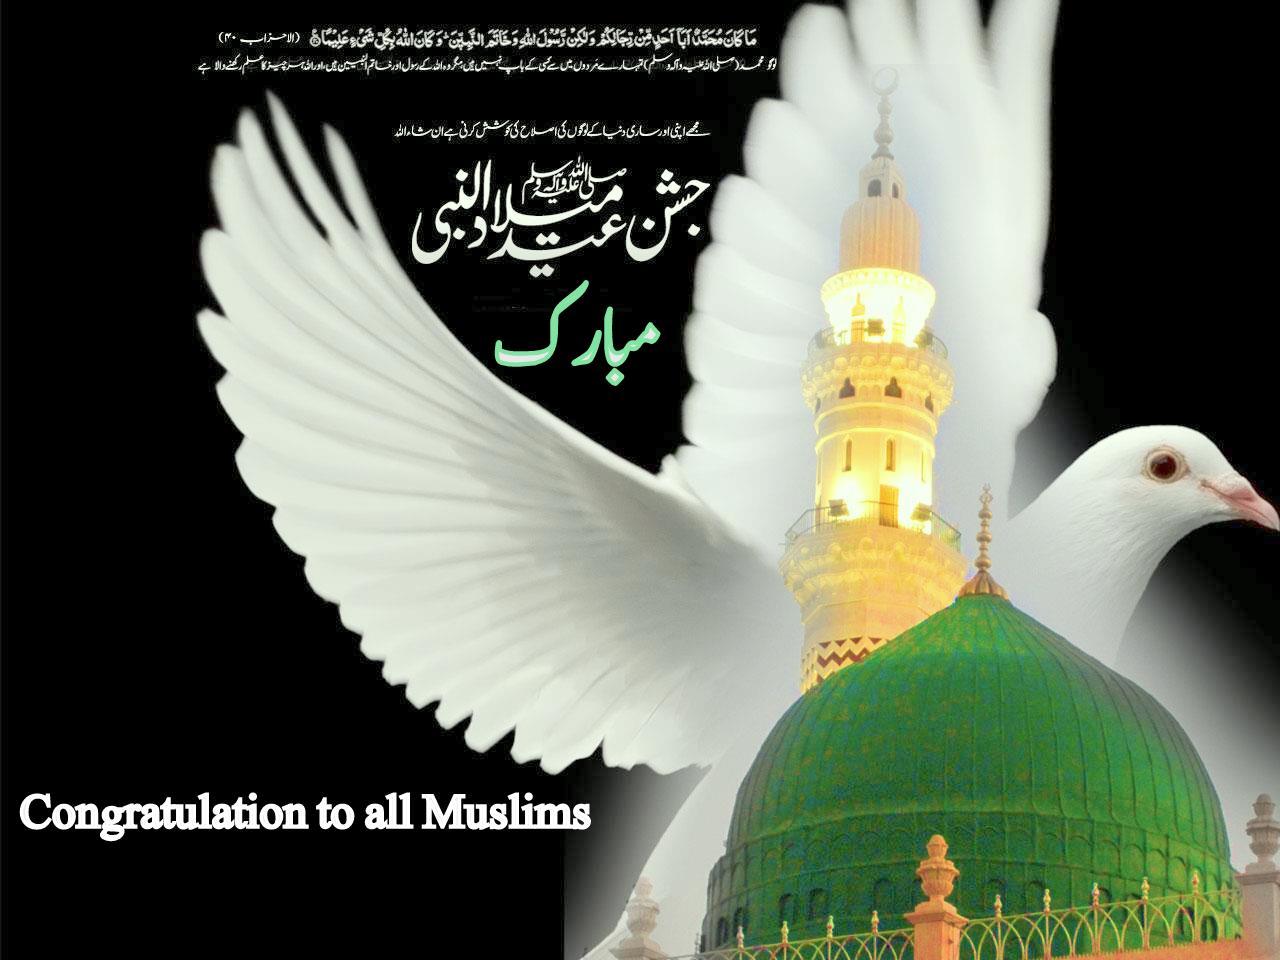 Eid Milad Un Nabi Saw Mubarak Cards And Banners Hd Quality